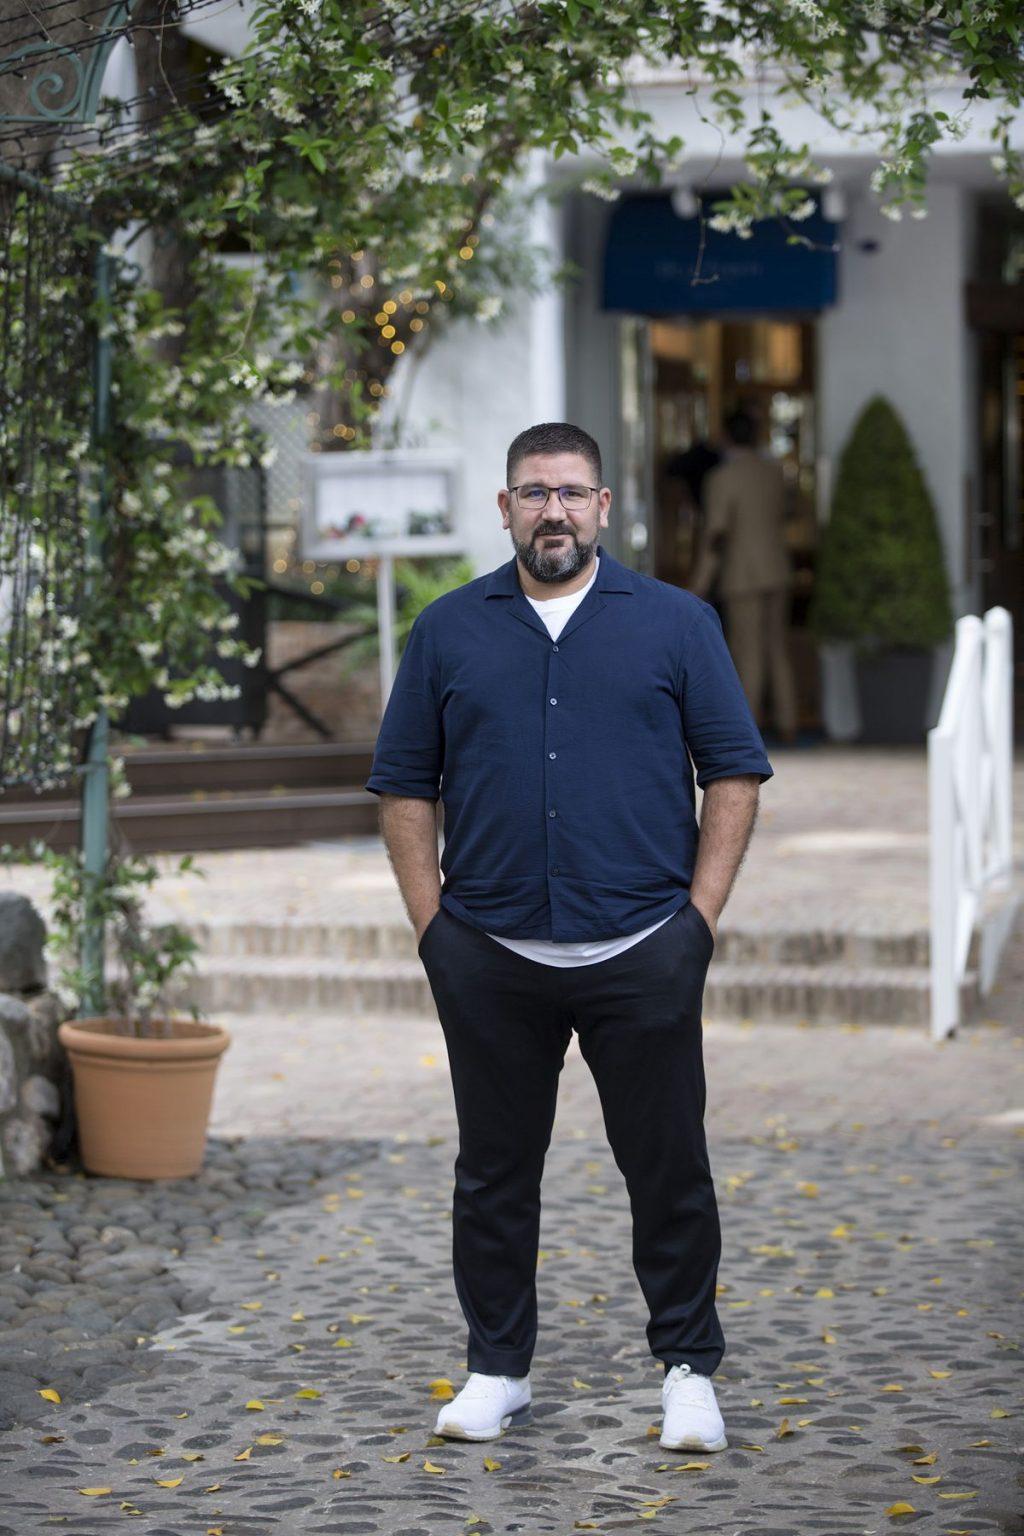 Dani Garcia: chef 100 million euros |  Business